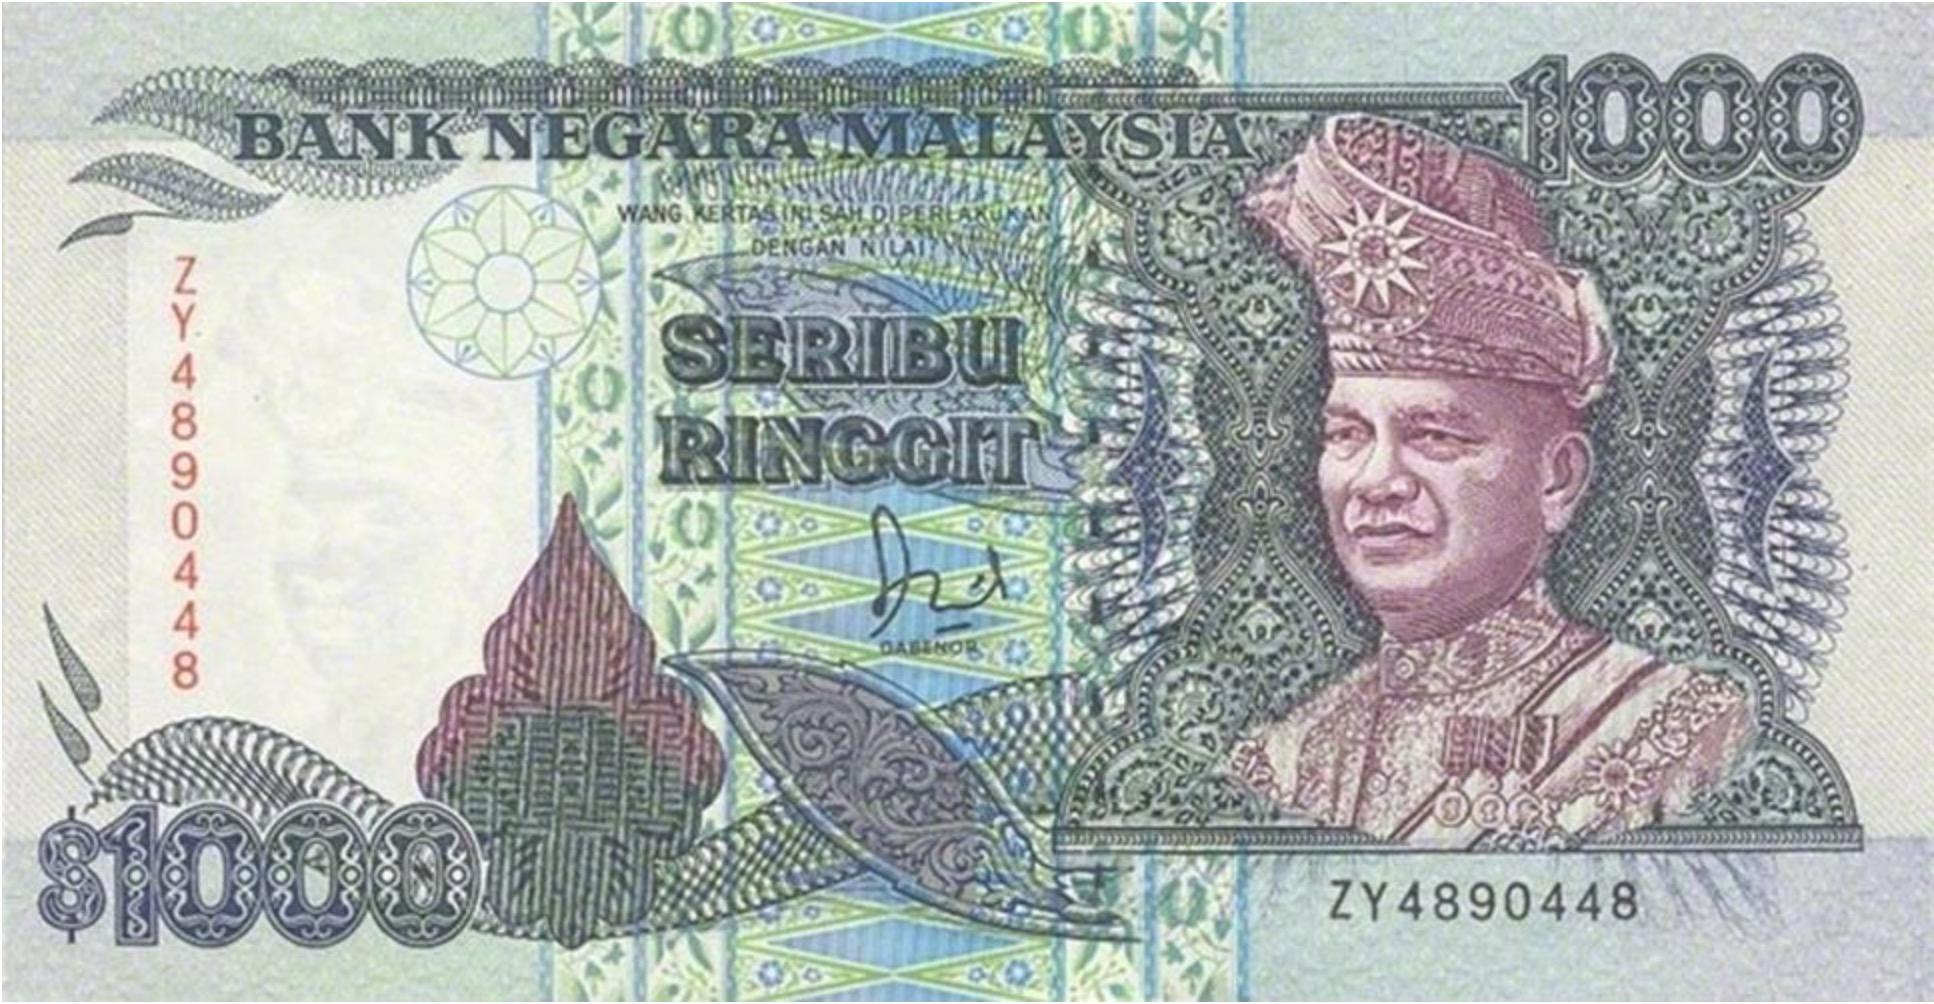 1000 Malaysian Ringgit (2nd series 1989)